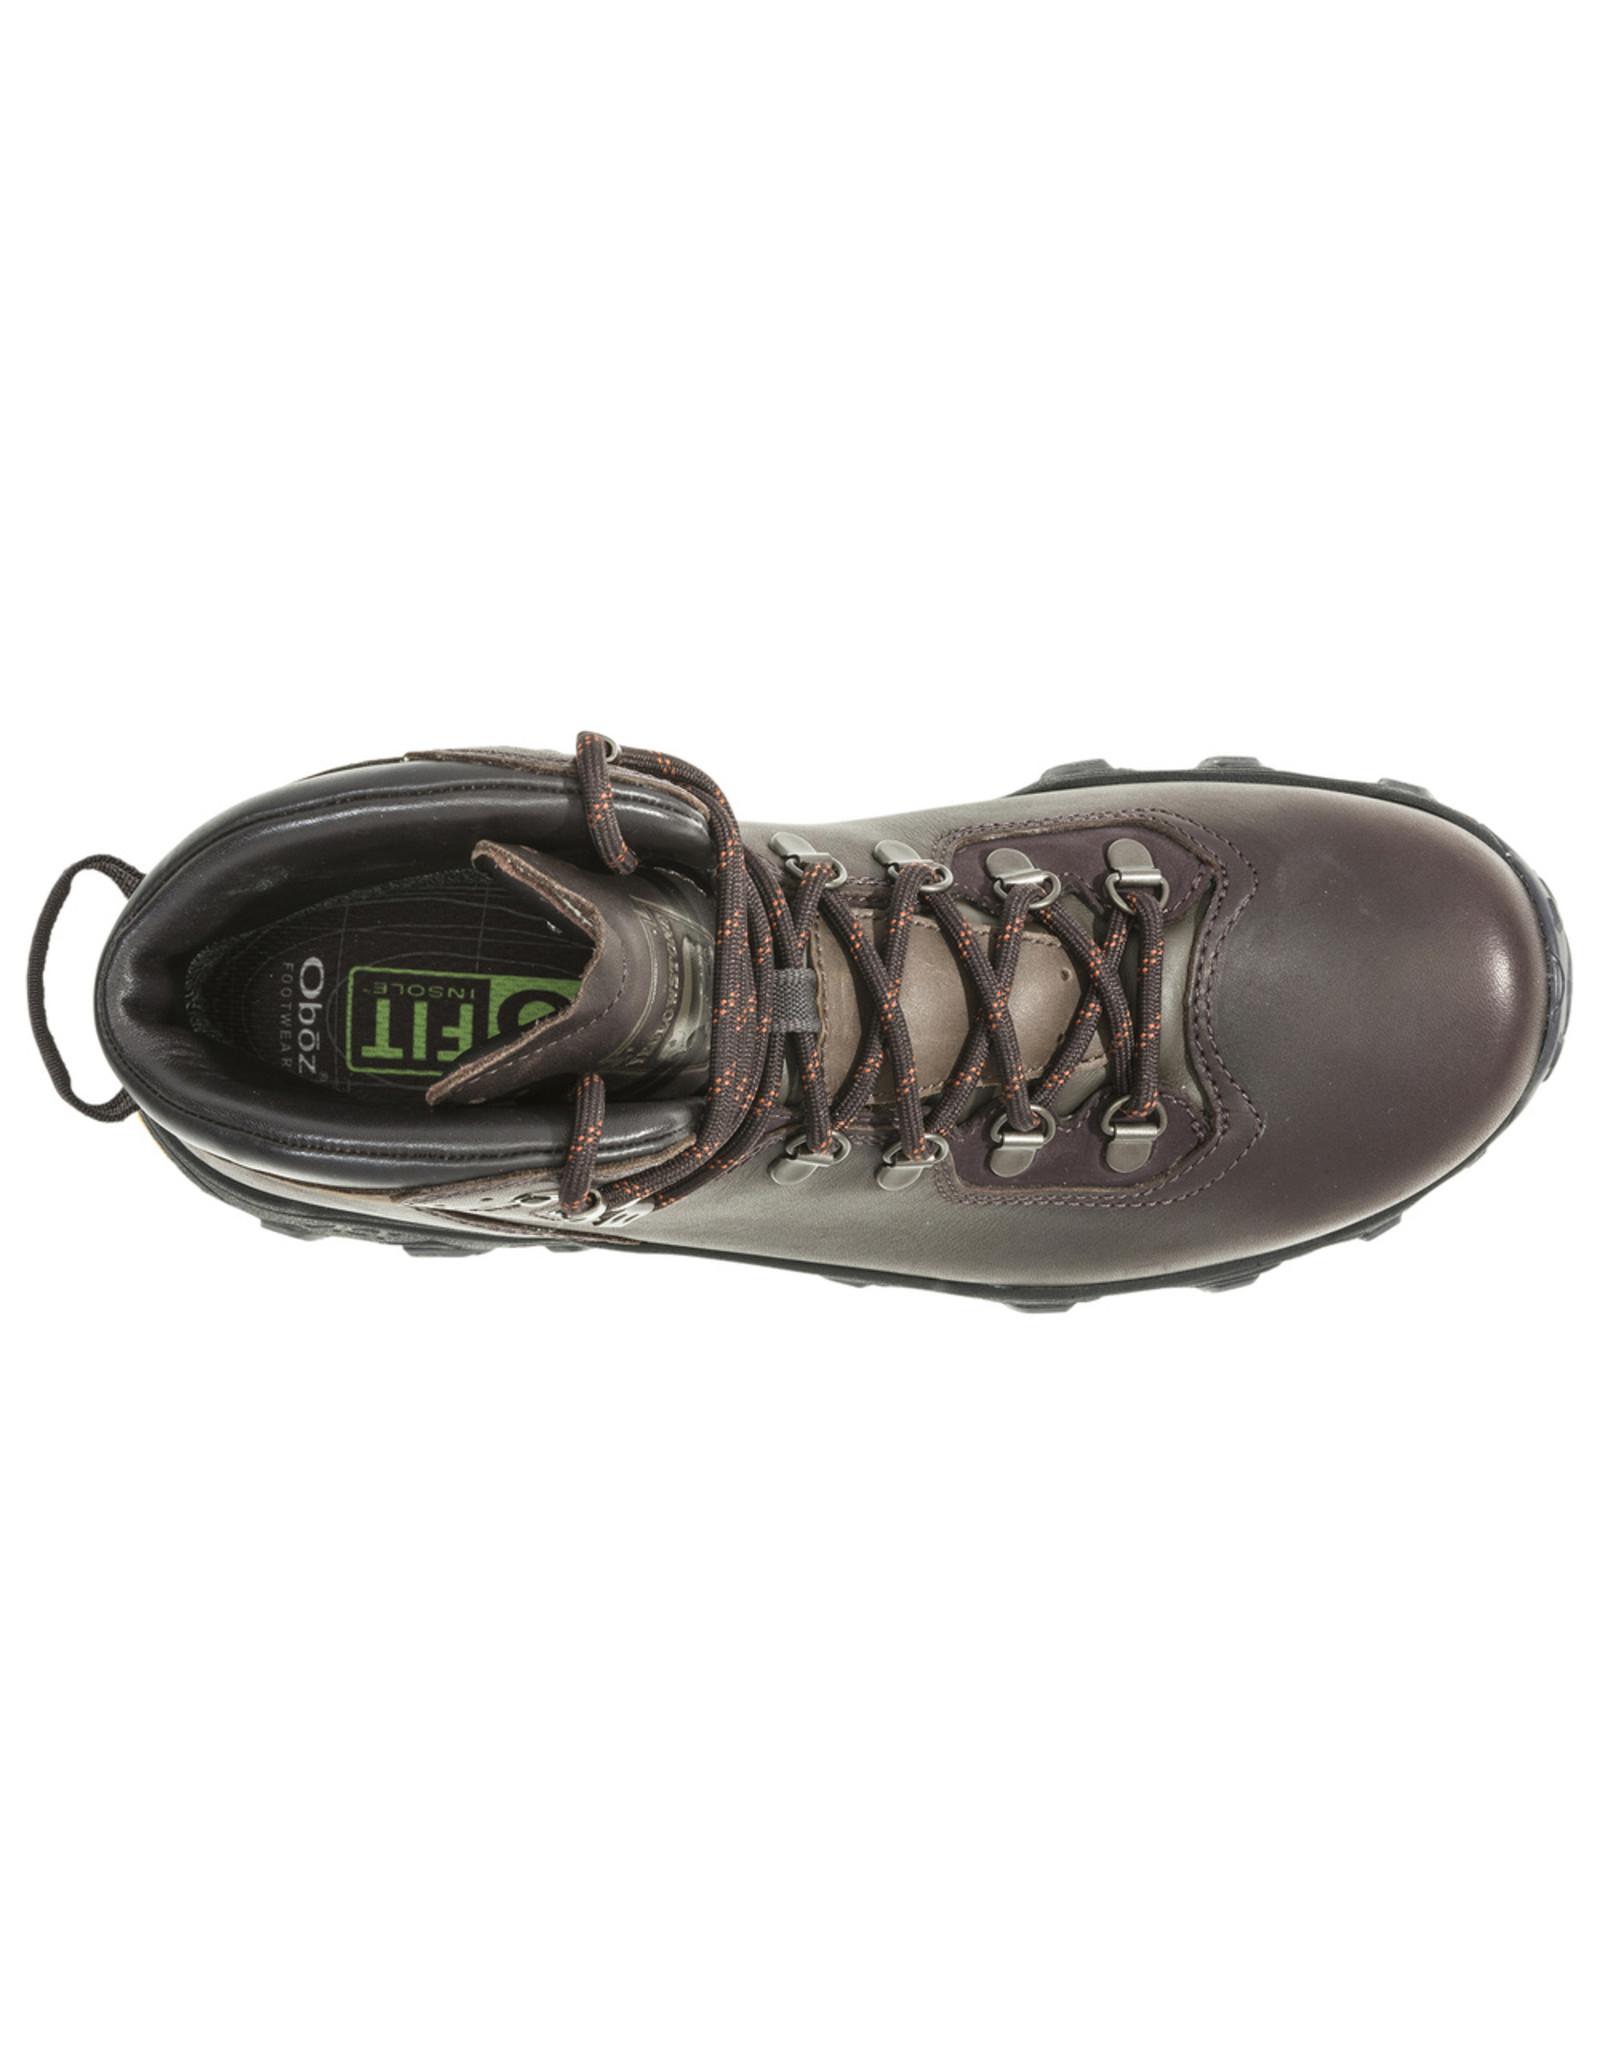 Oboz Oboz Yellowstone Premium Mid Waterproof Hiking Boots - Women's